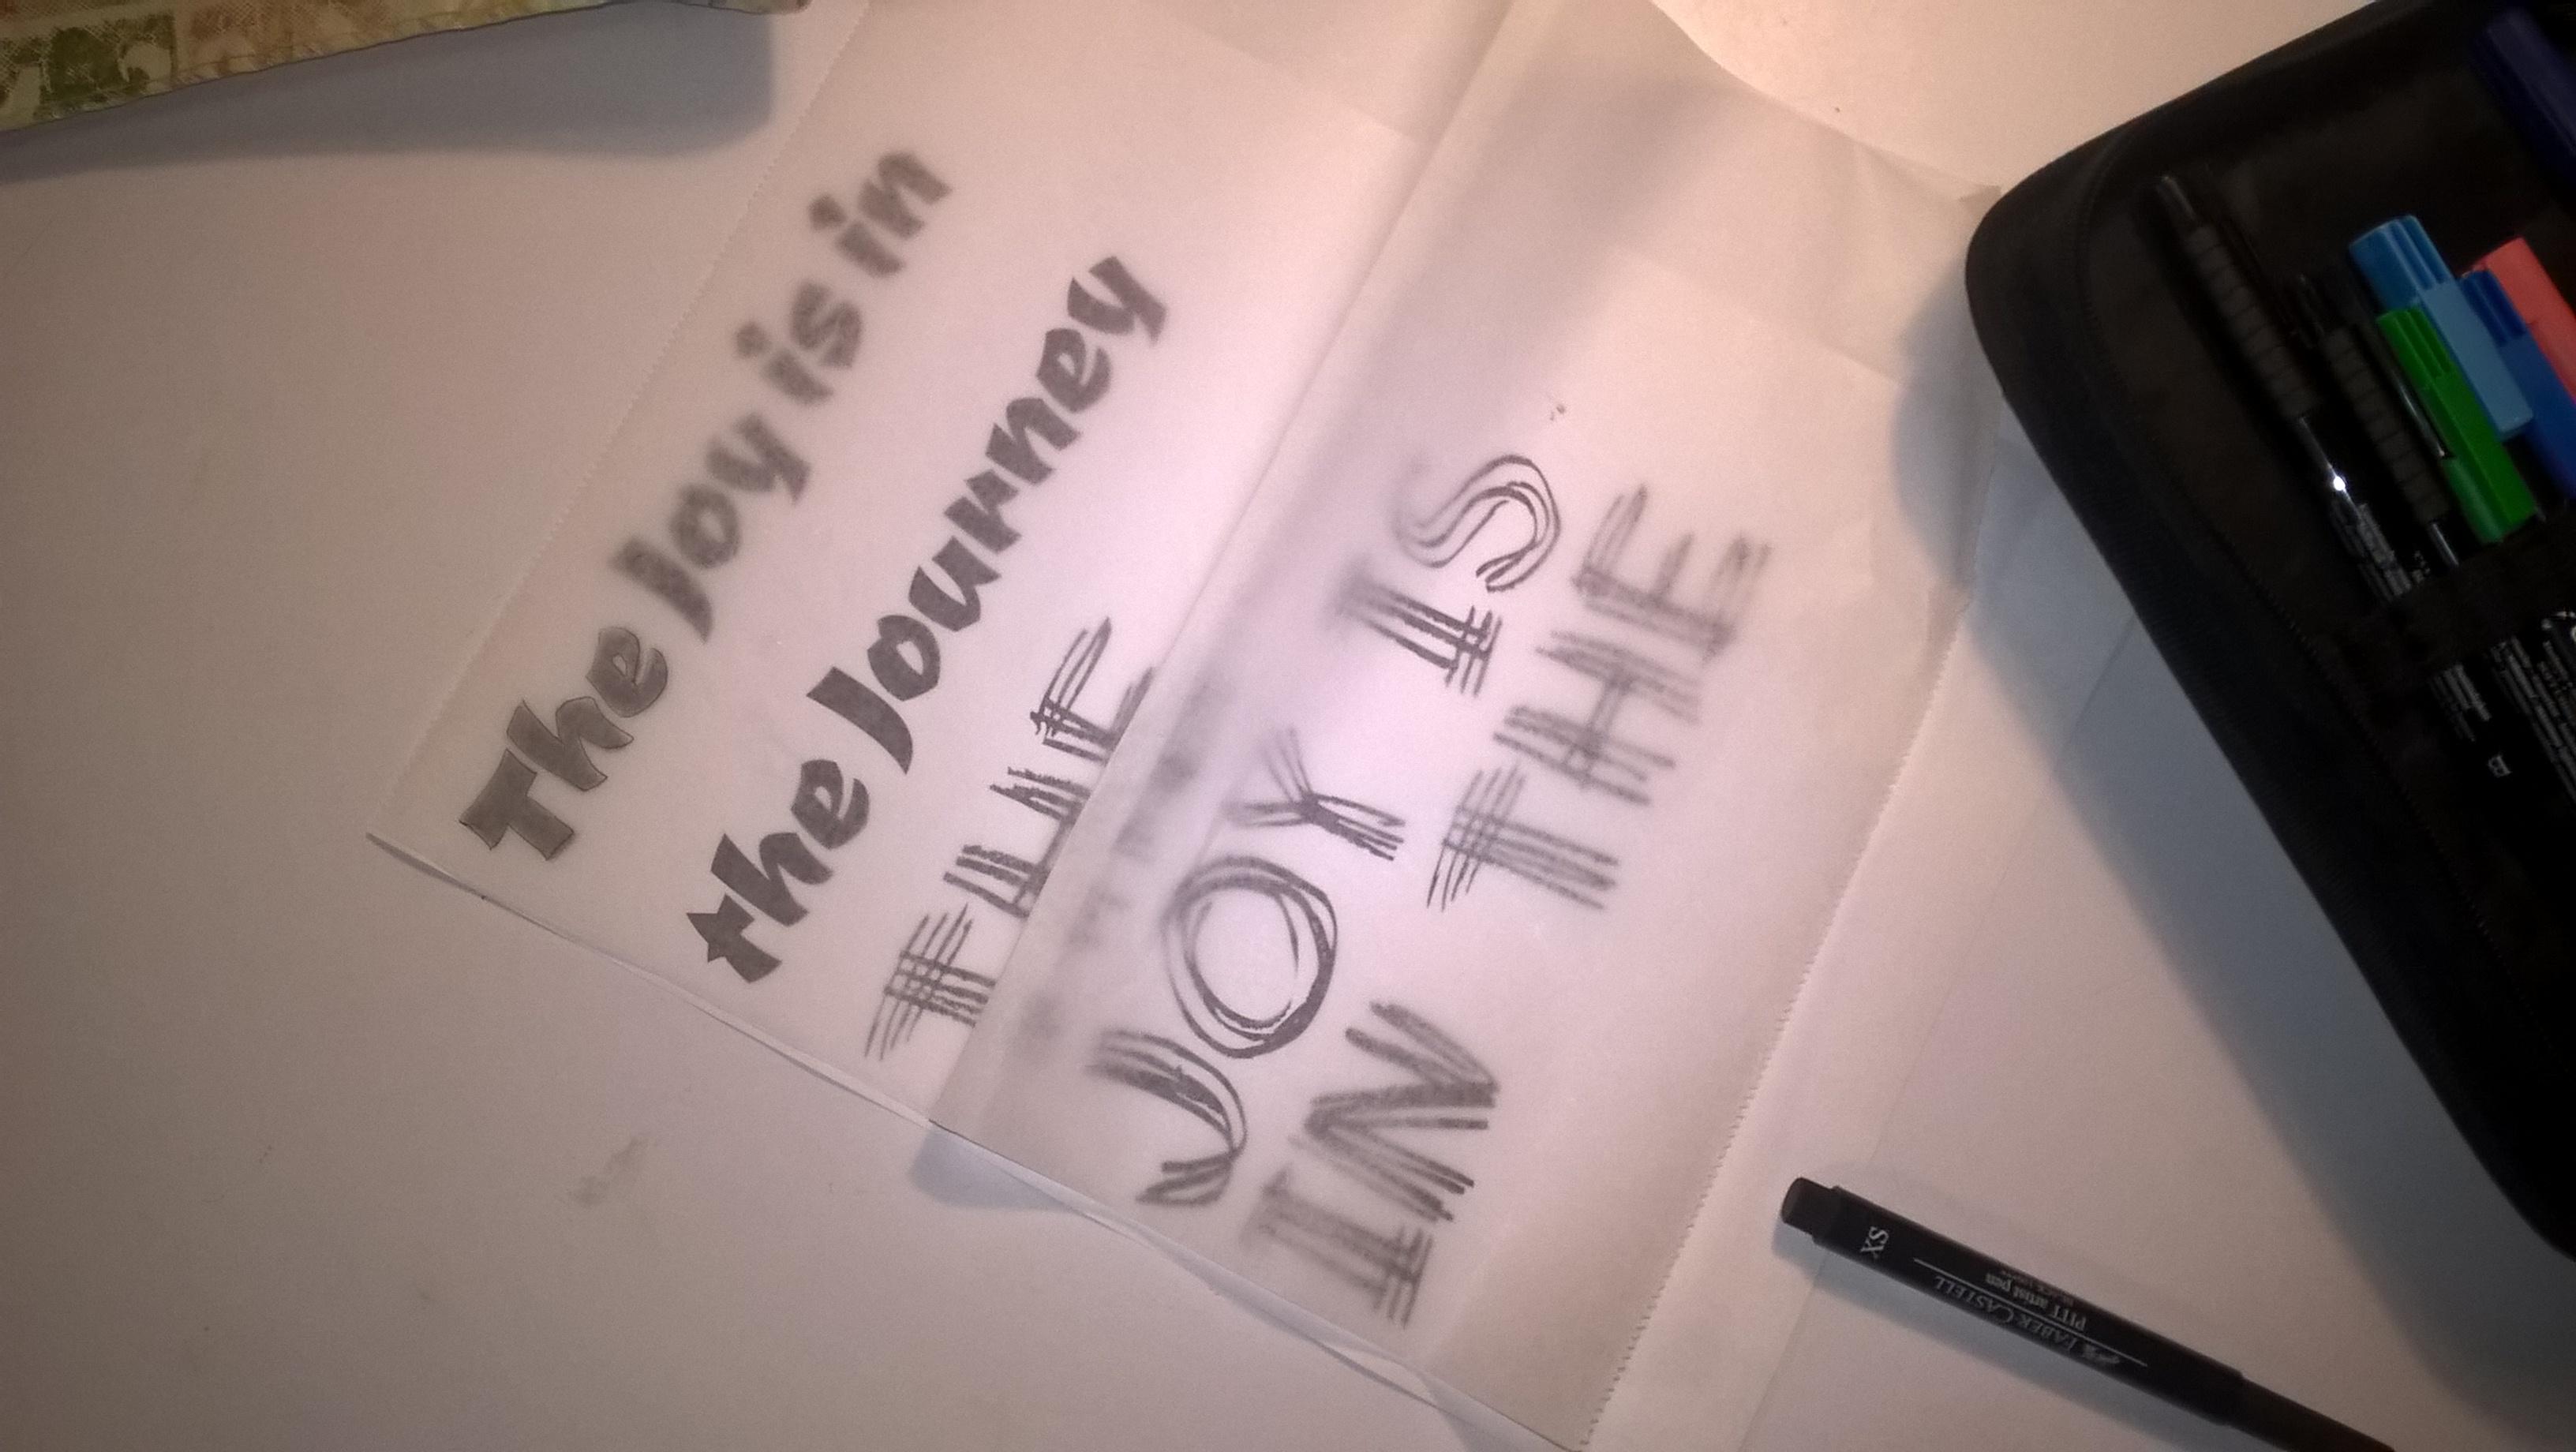 copying printed words through deli paper